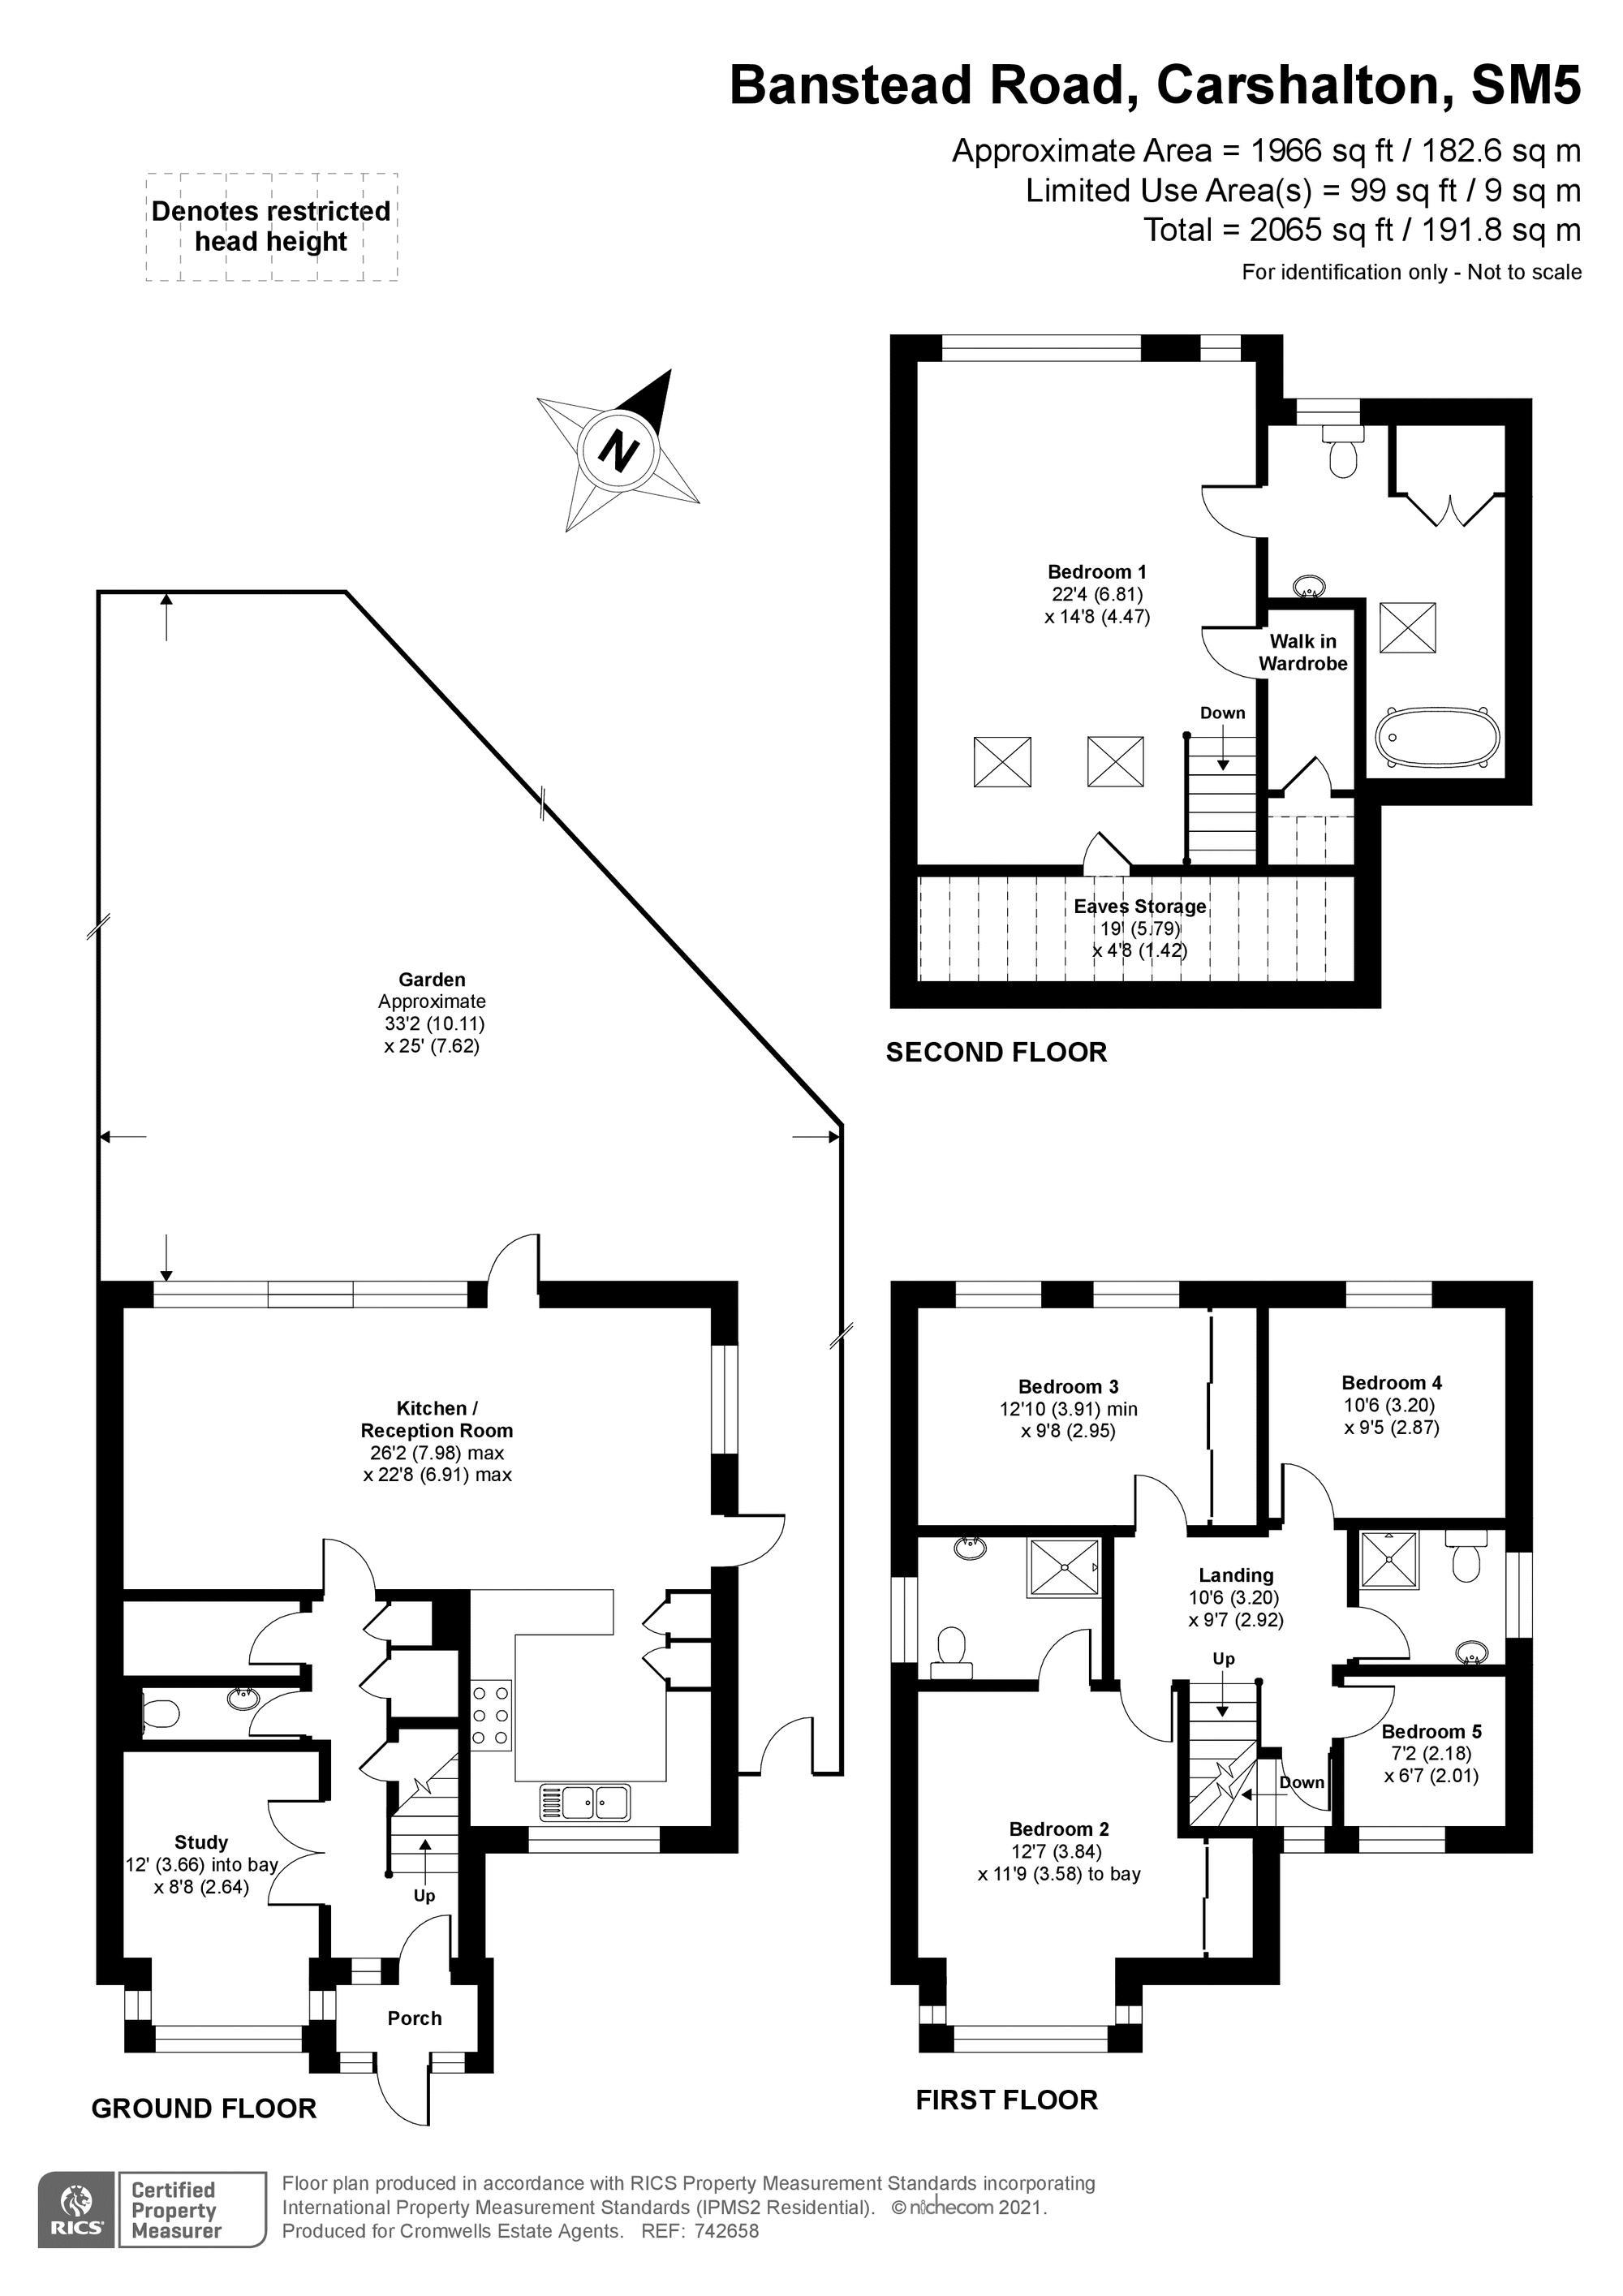 5 bedroom detached house SSTC in Carshalton Beeches - floorplan 1.